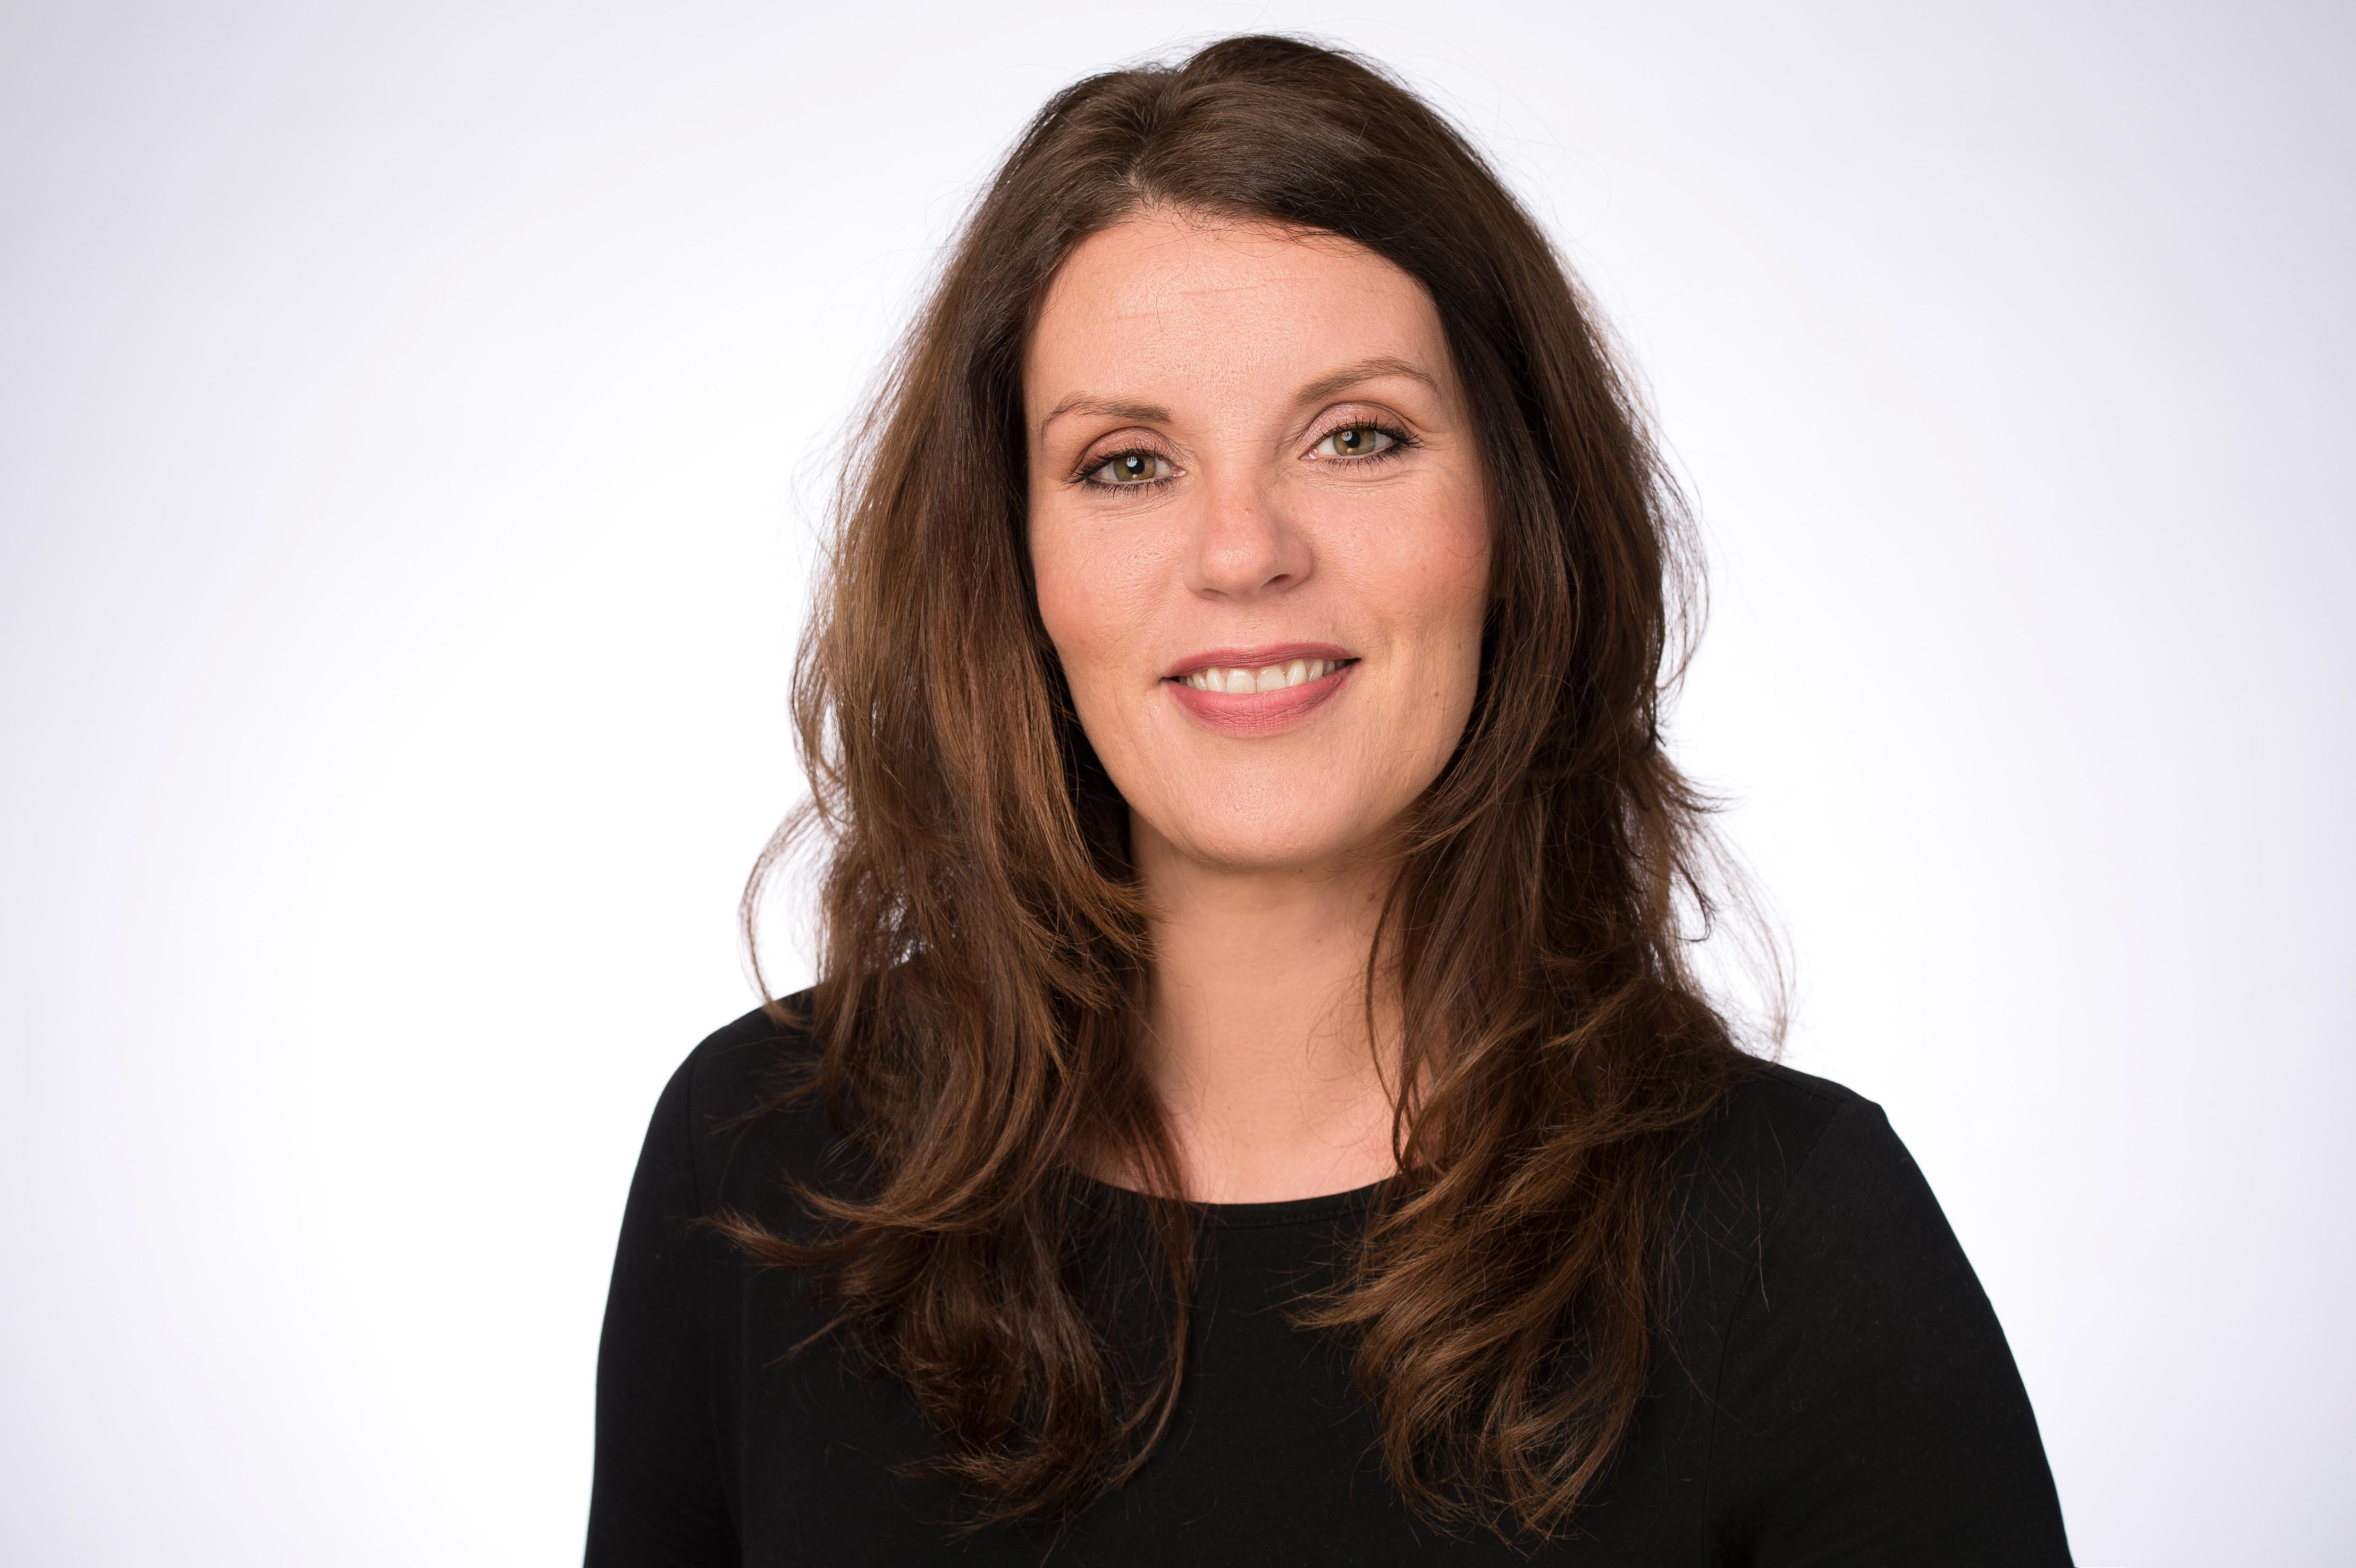 Angela Tautrims